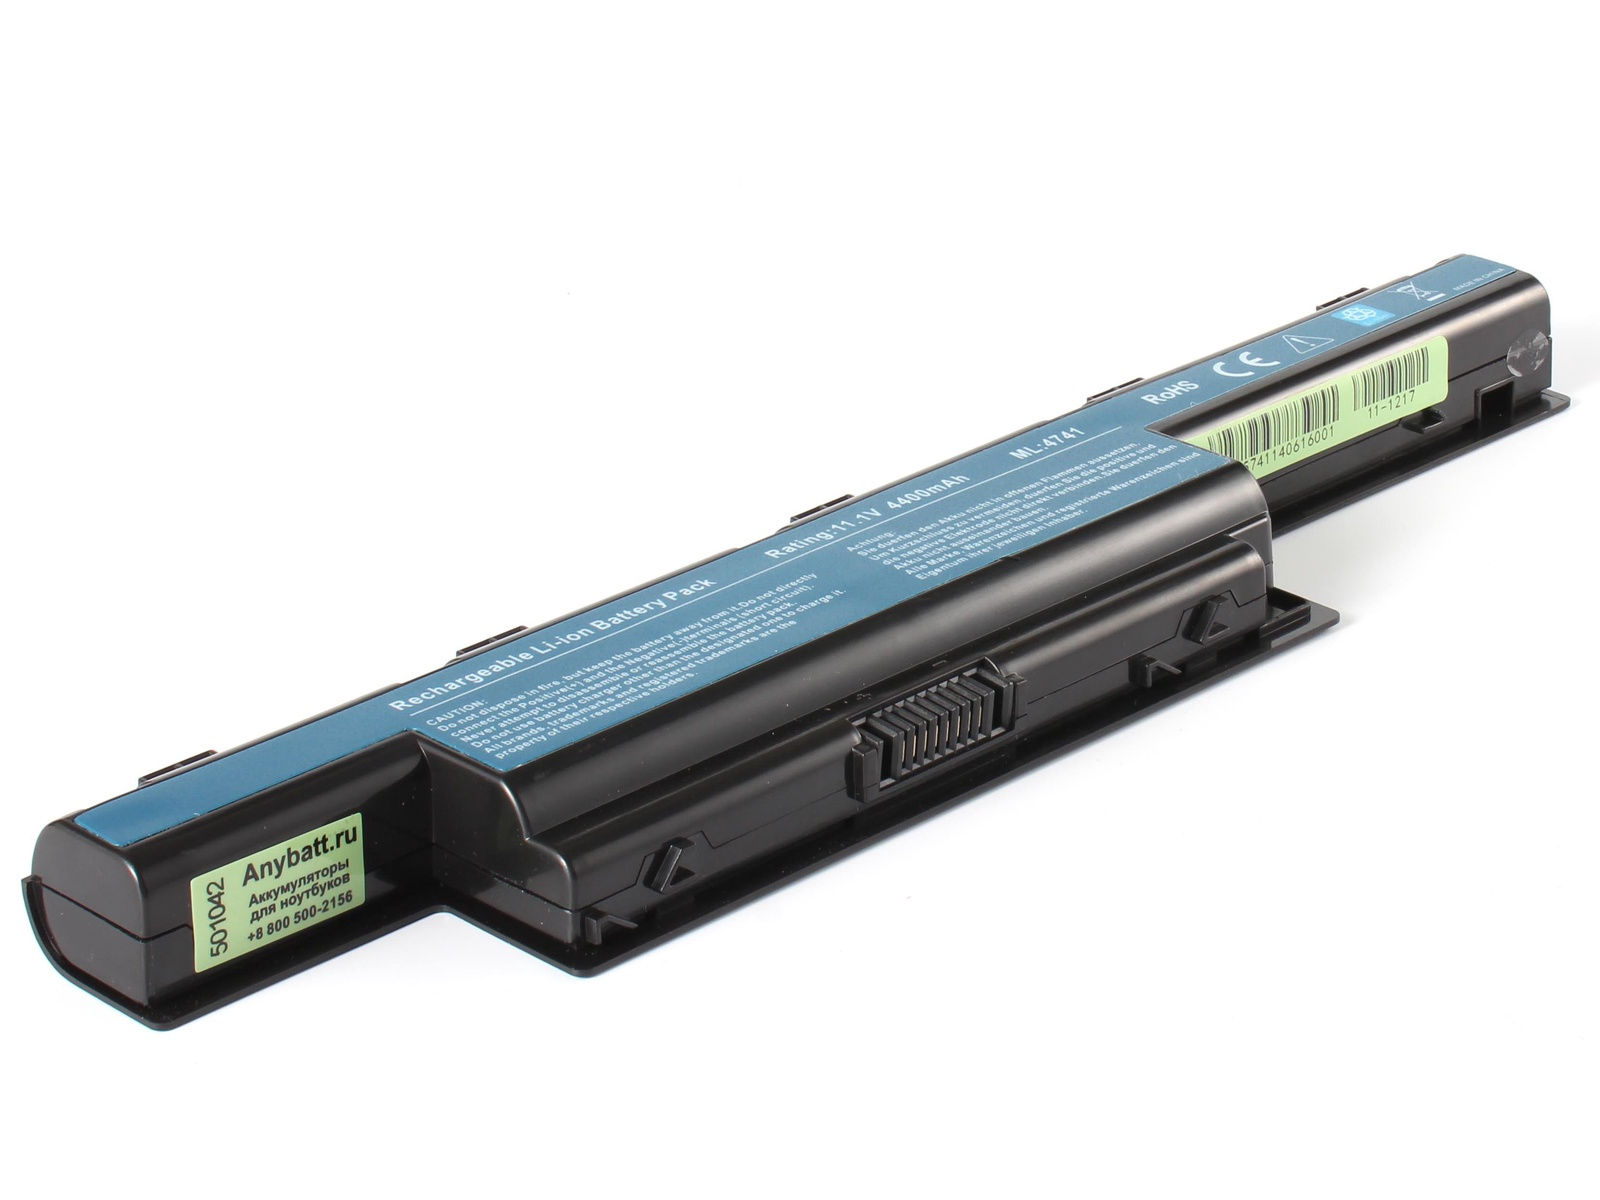 Аккумулятор для ноутбука AnyBatt для Acer Aspire V3-731, Aspire E1-571G-53234G50Mnks, TravelMate 5740, Aspire V3-571G-53236G75Maii, Aspire V3-571G-53216G50Makk, Aspire V3-531, Aspire 4738ZG, Aspire V3-551G-84506G50Makk nokotion laptop motherboard for acer aspire v3 771 e1 731 e1 771 v3 731 va70 vg70 main board nbmg711001 nb mg711 001 ddr3